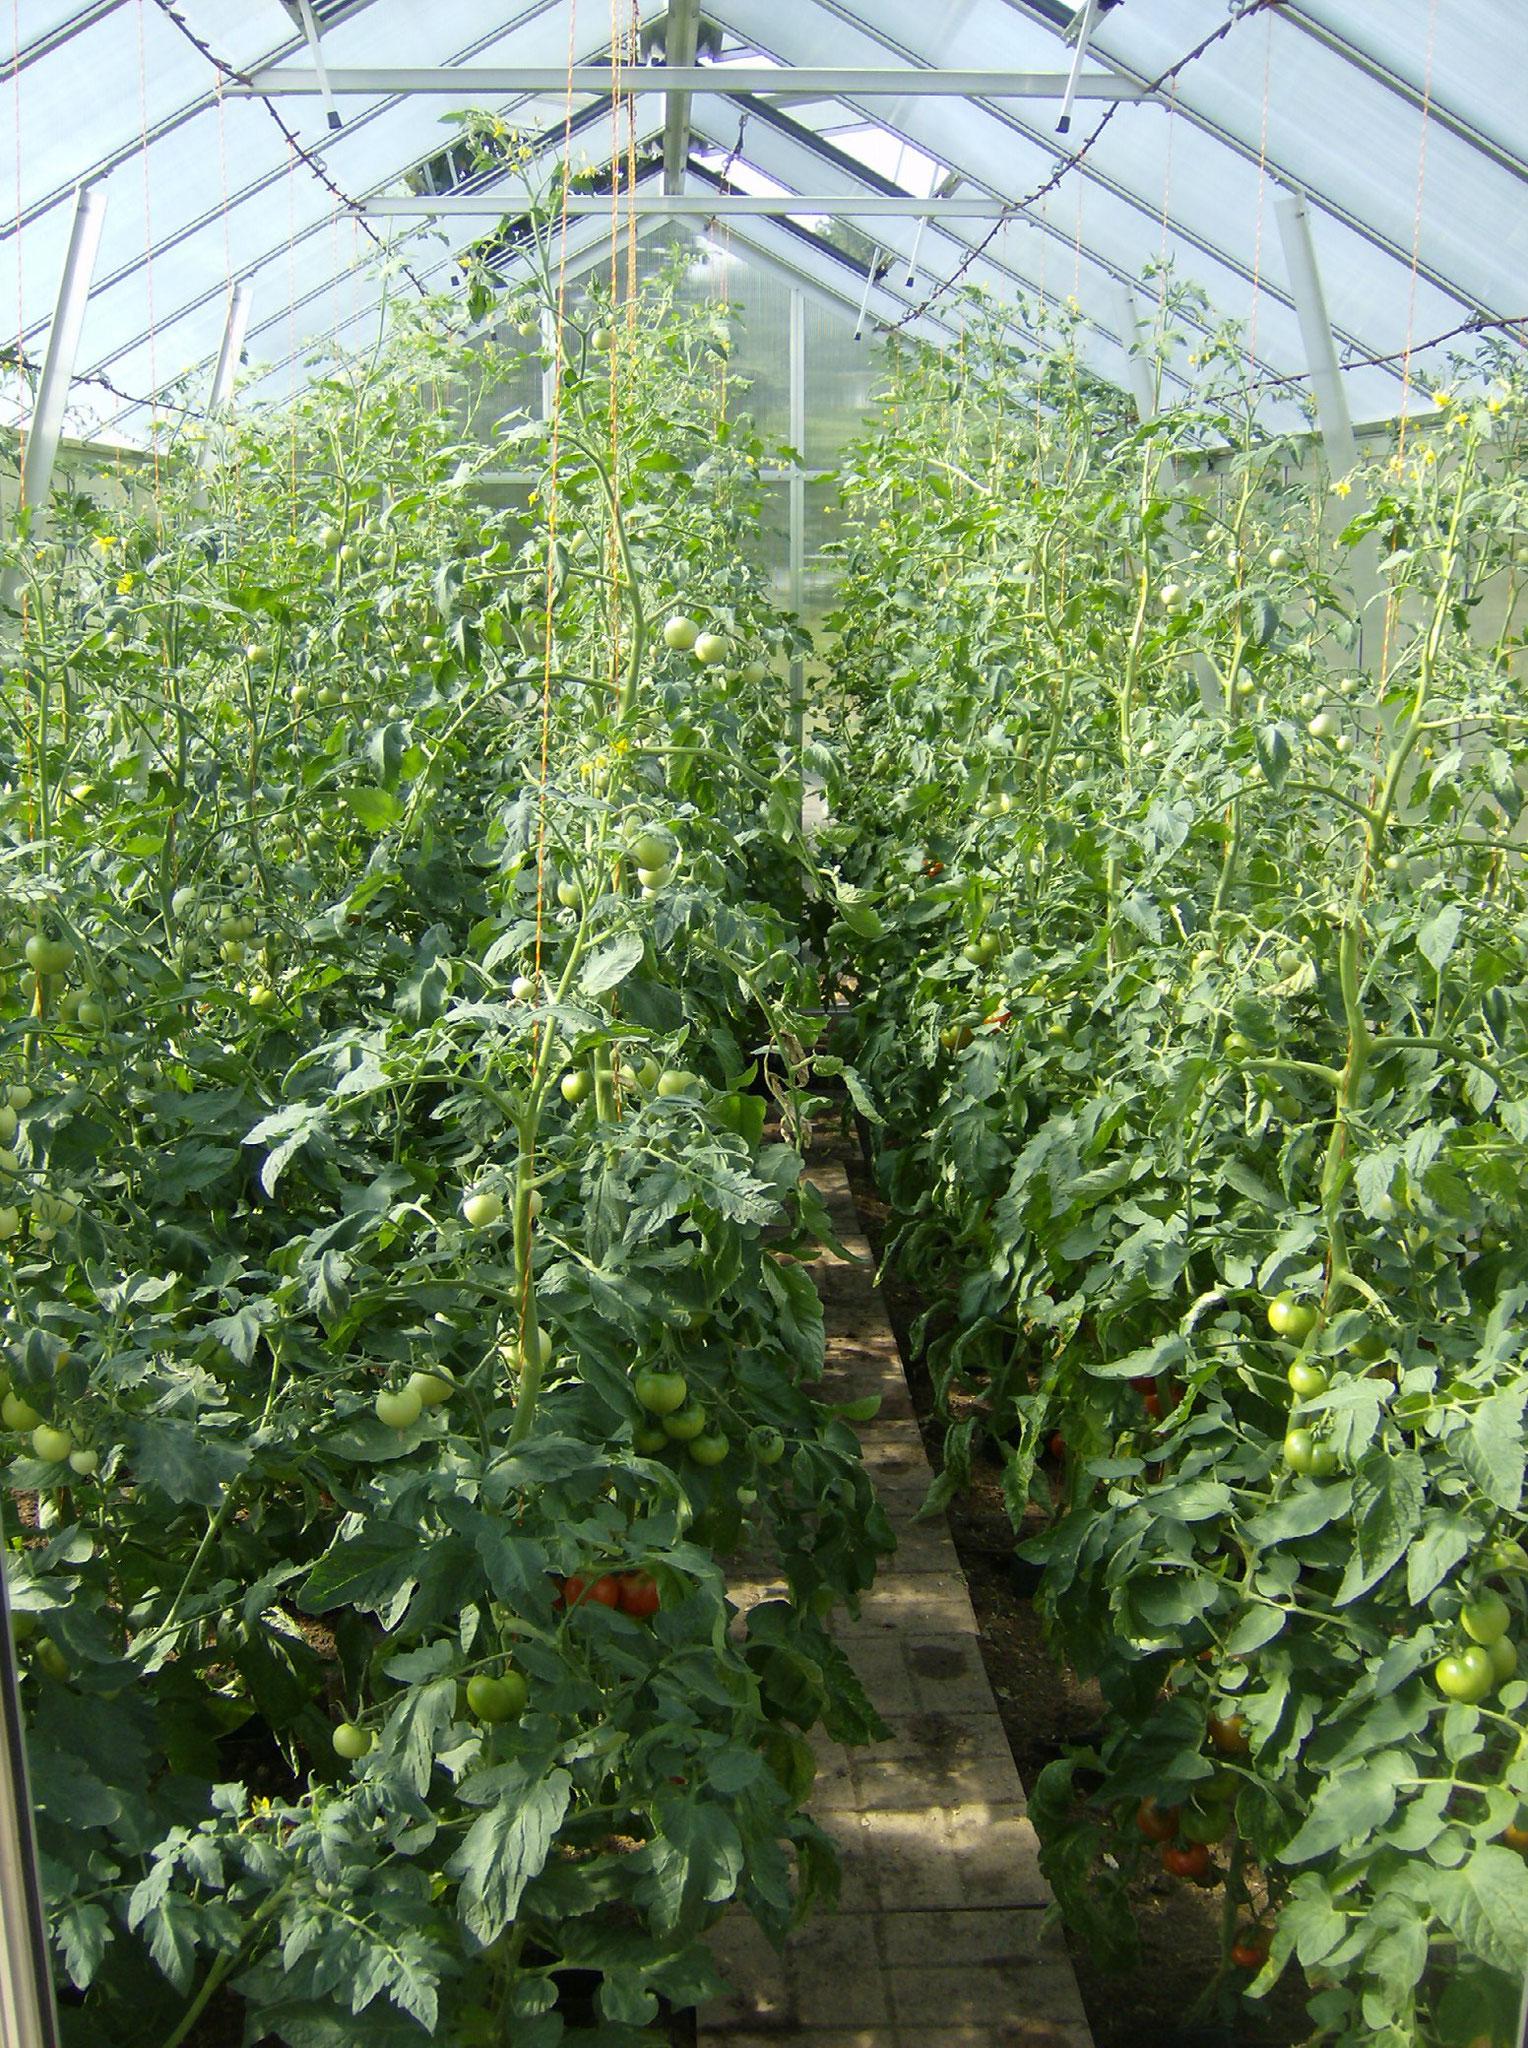 Tomaten wachsen bei uns besonders gut